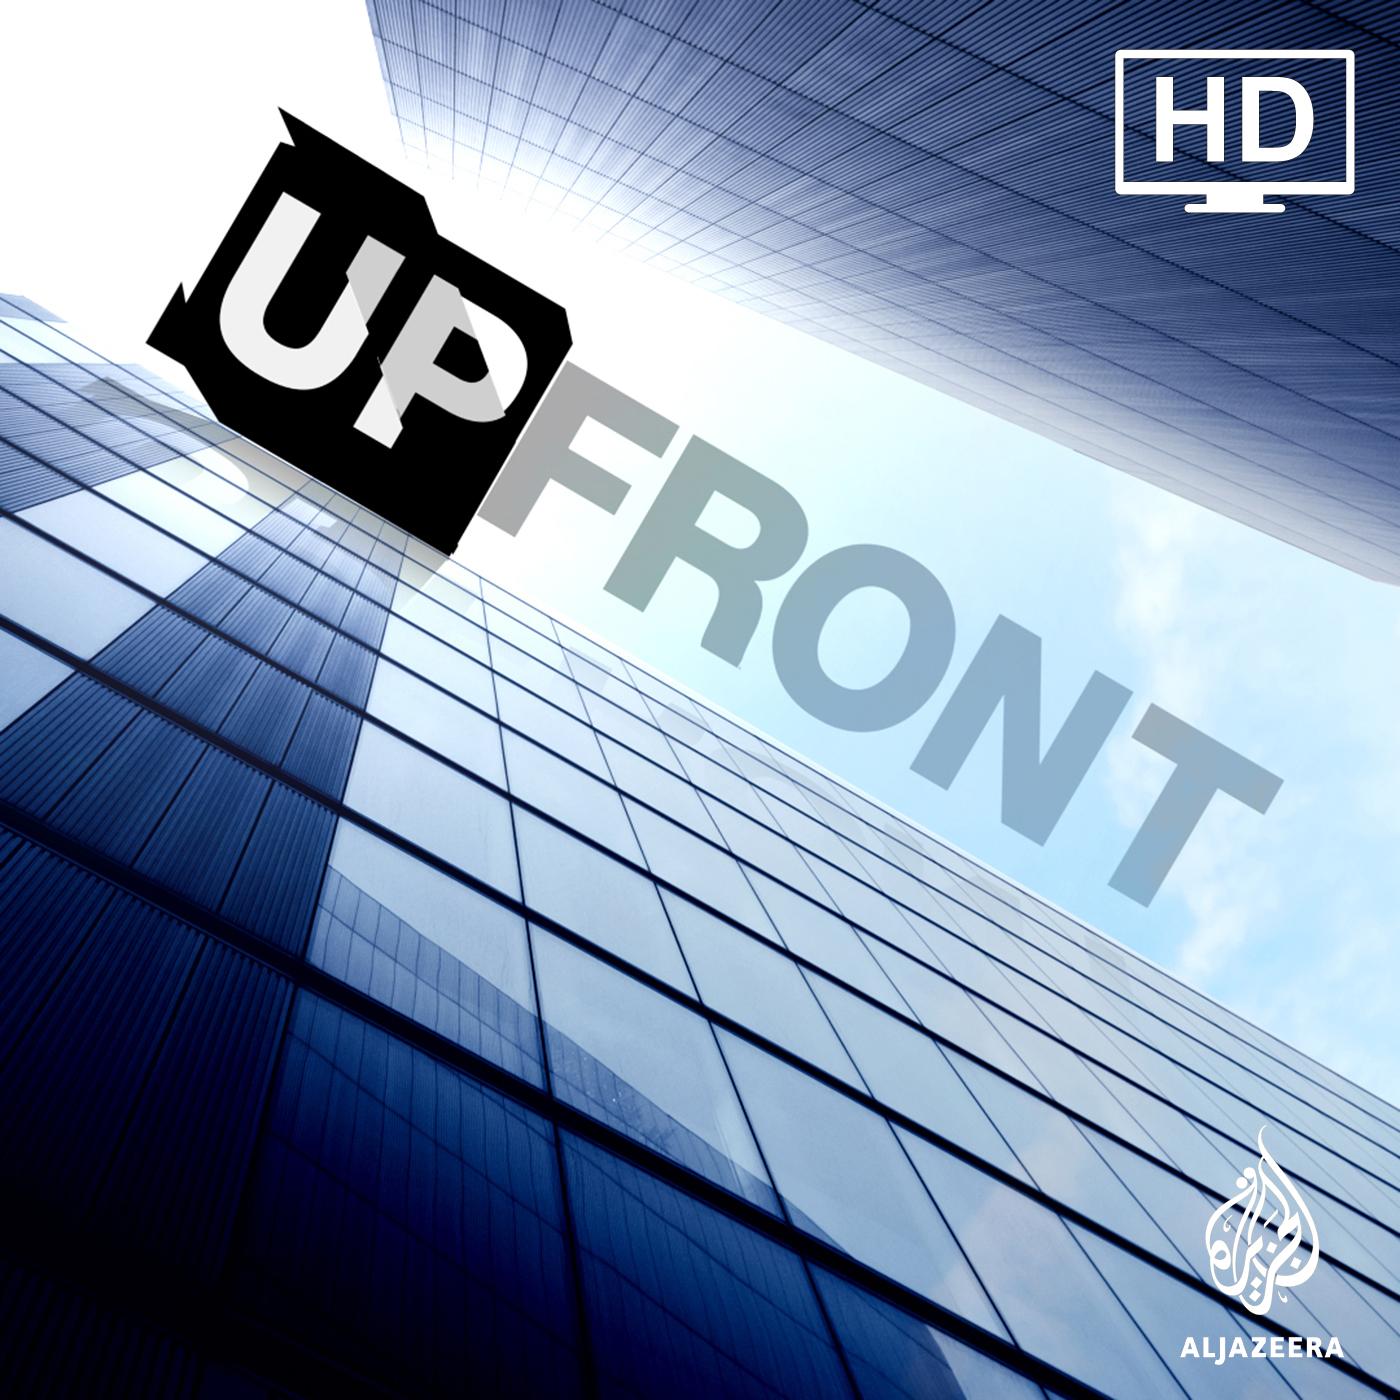 UpFront - HD